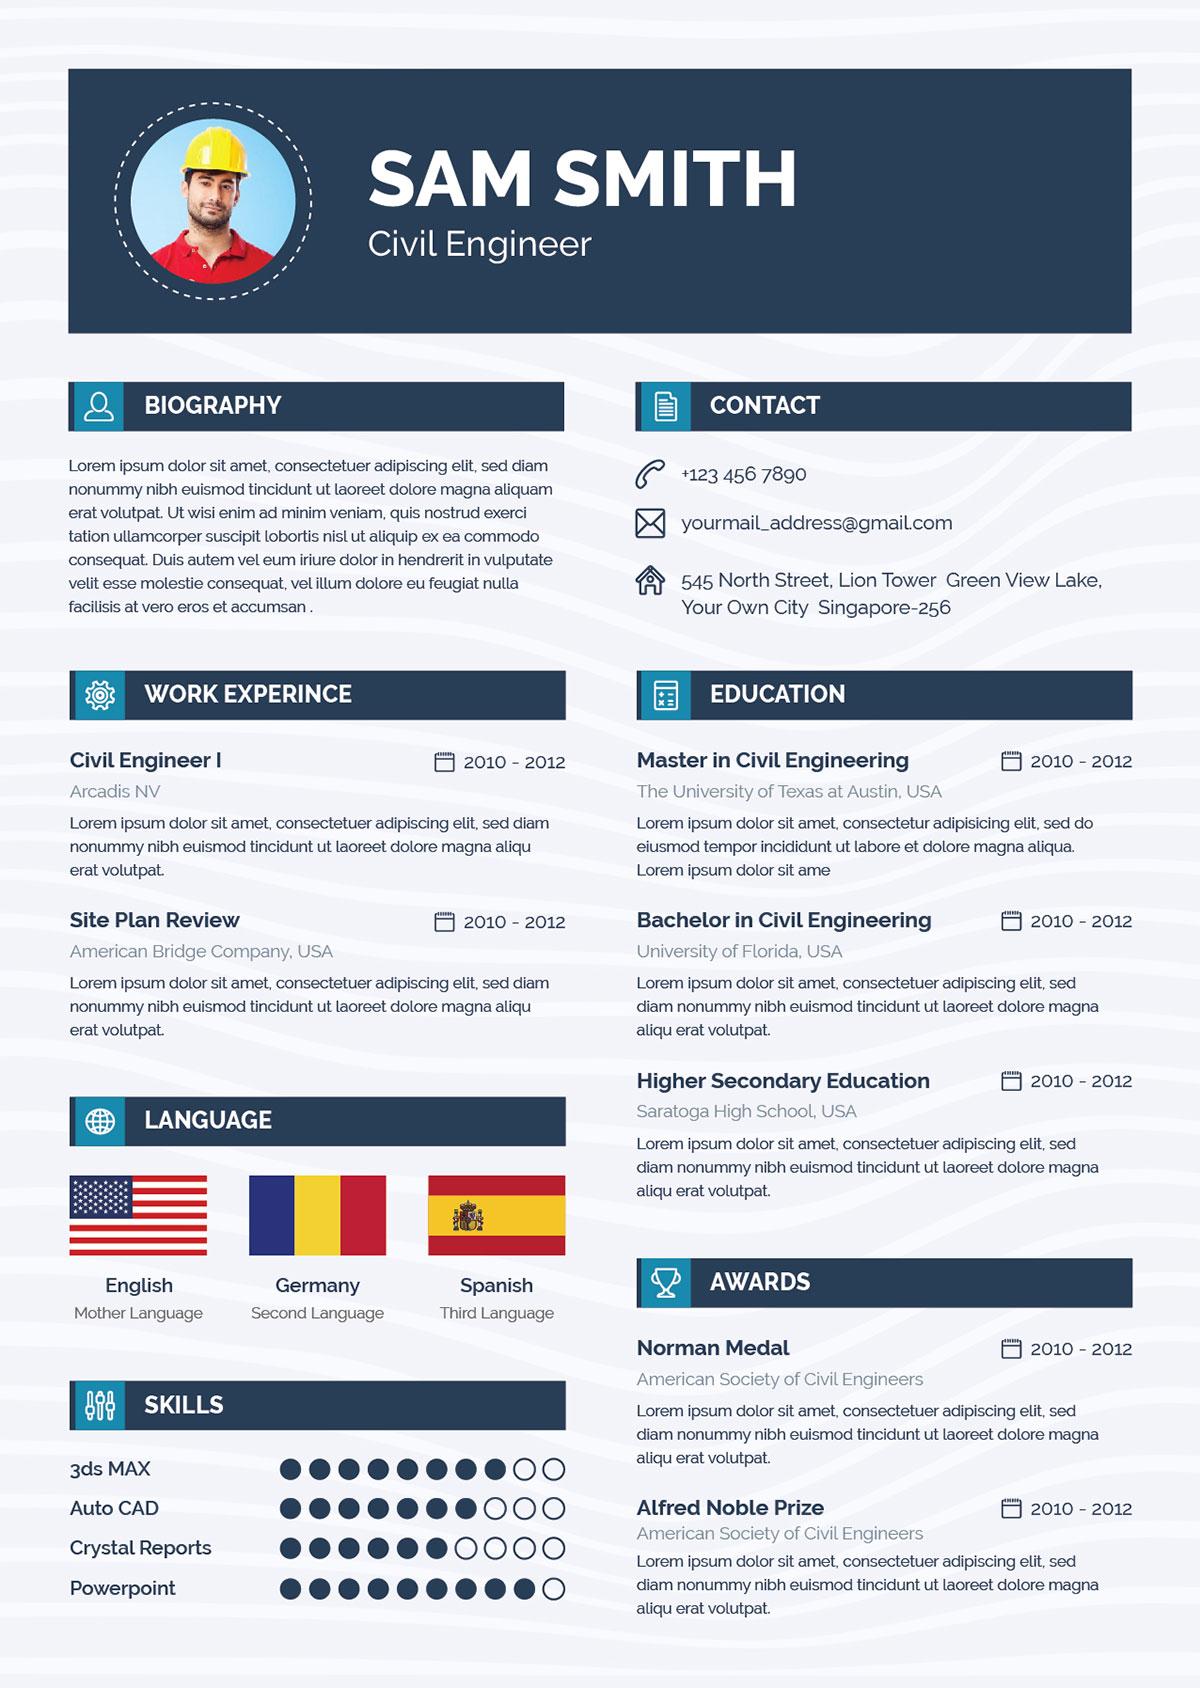 Free-Ai-Resume-CV-Template-for-Civil-Engineer